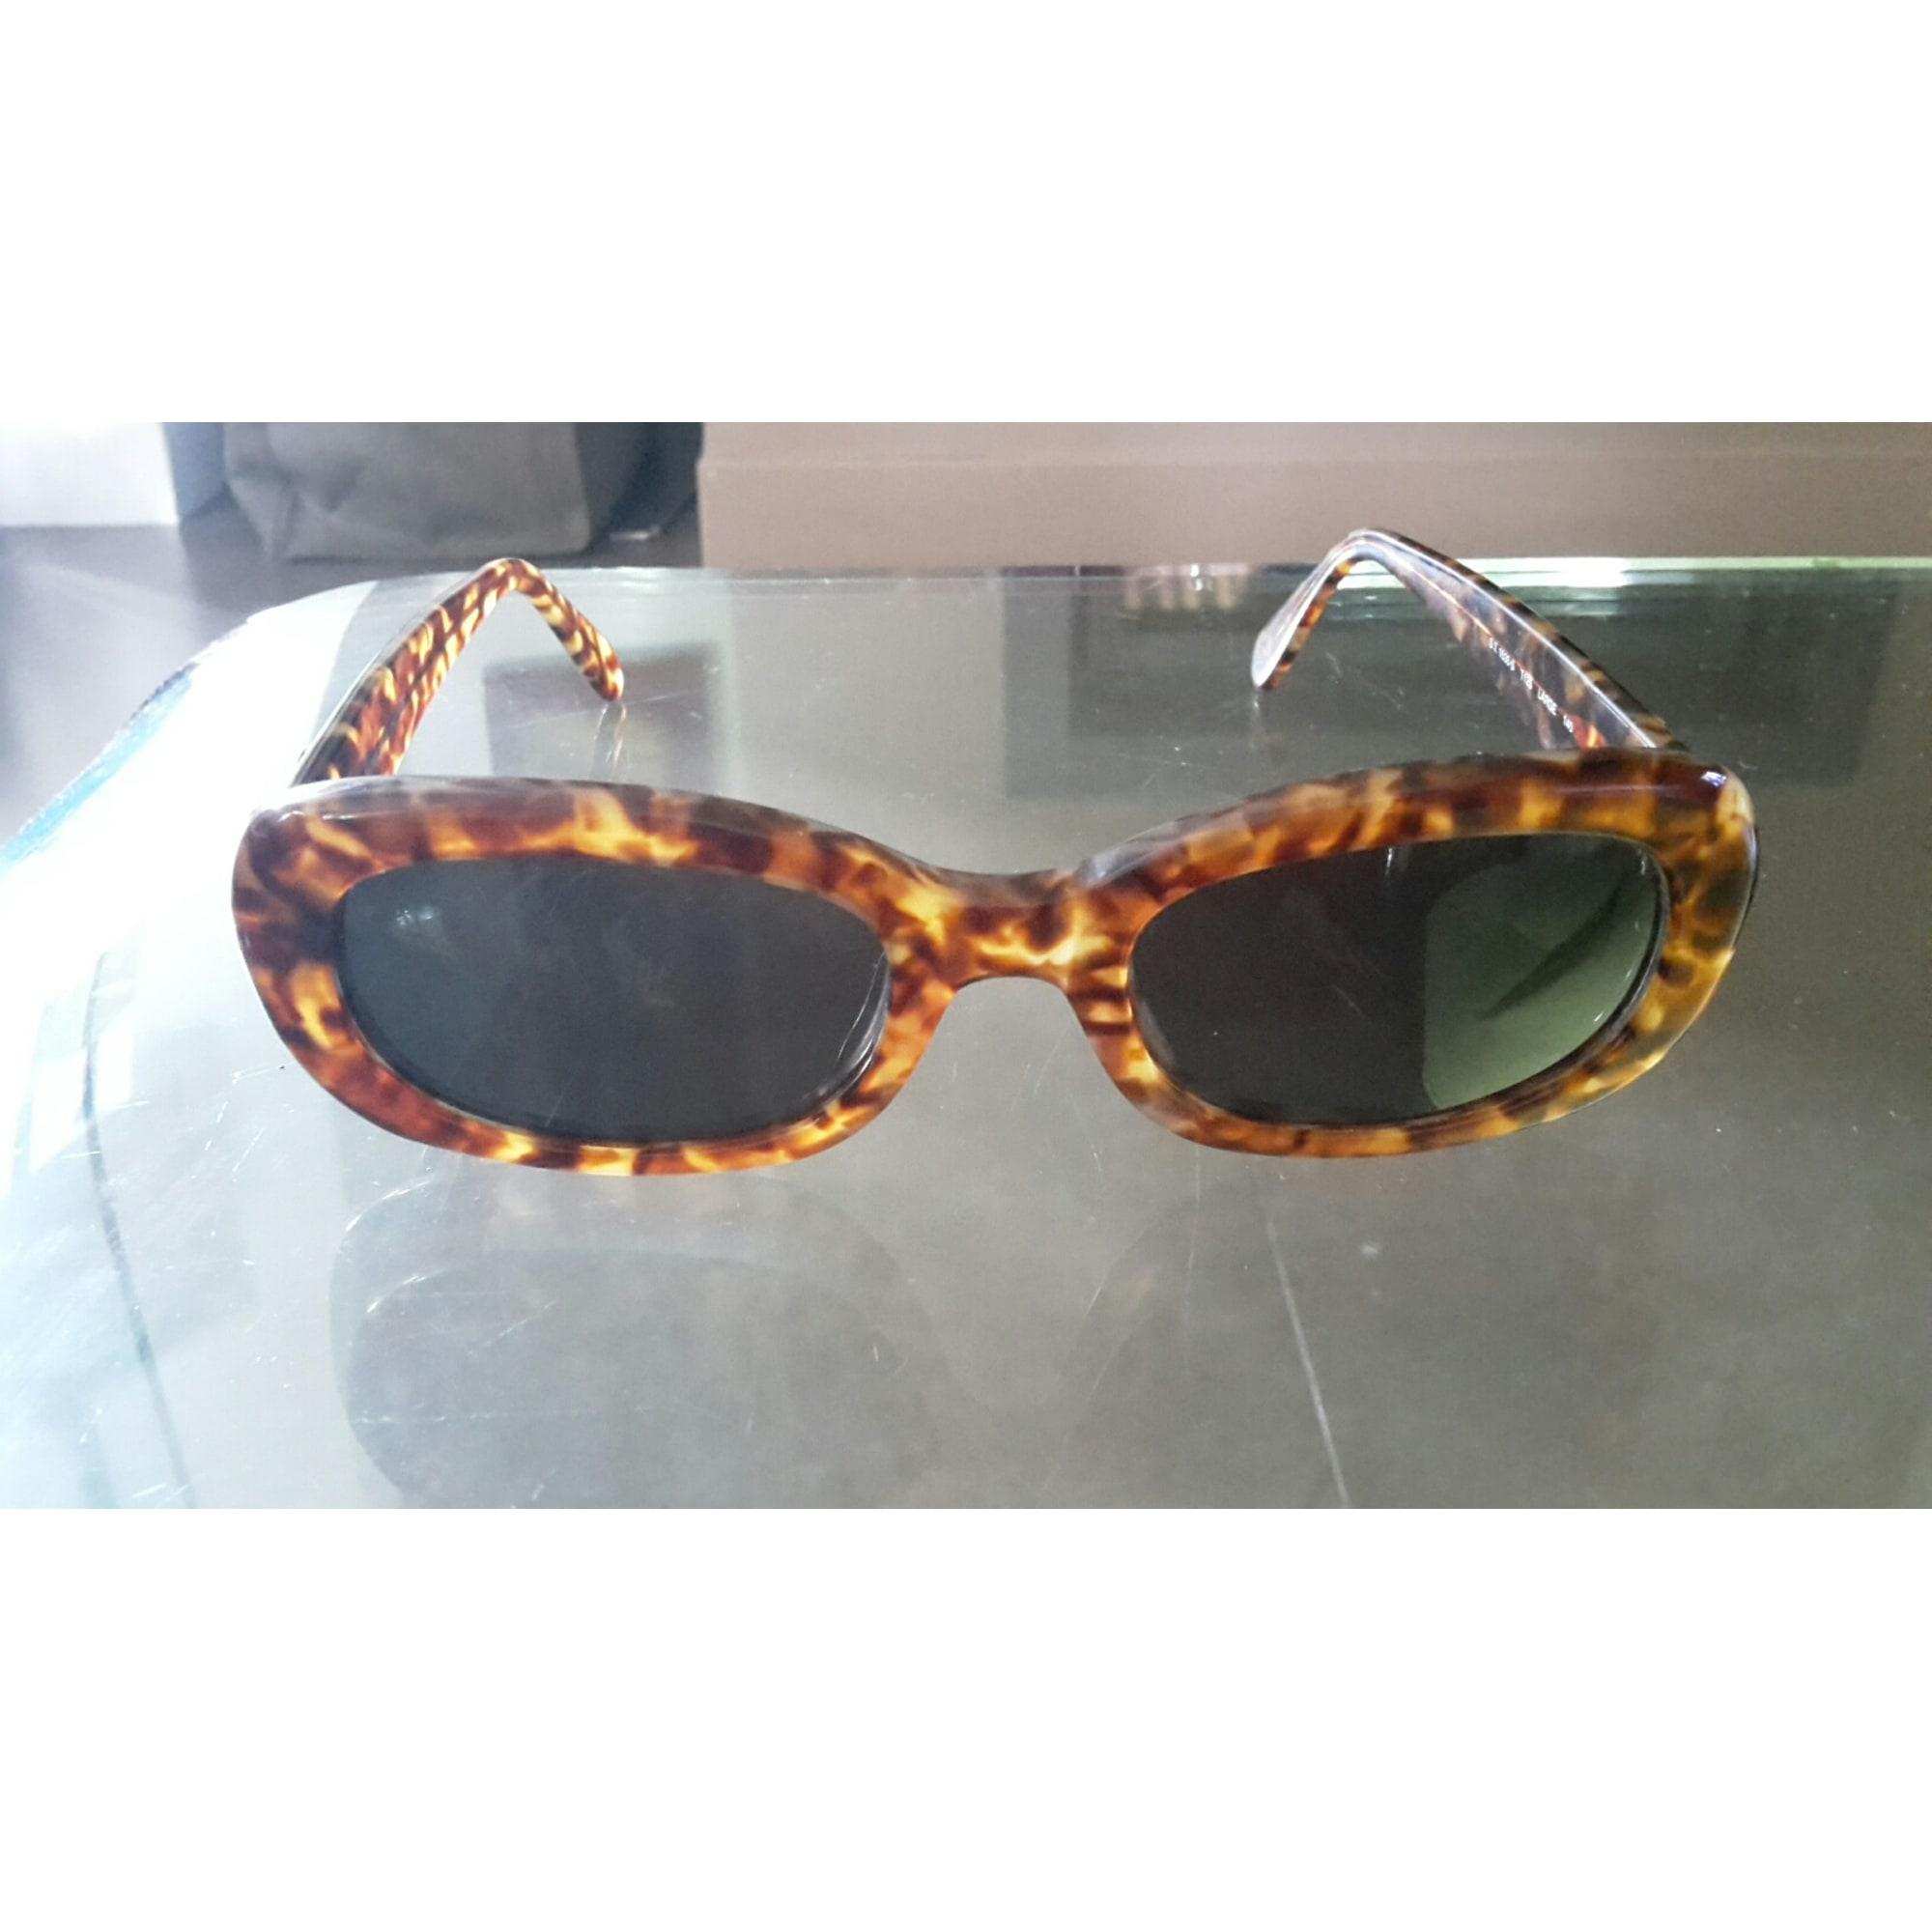 ba49ae02f7f360 Lunettes de soleil SERGIO TACCHINI ecaille vendu par Maud 92194651 ...